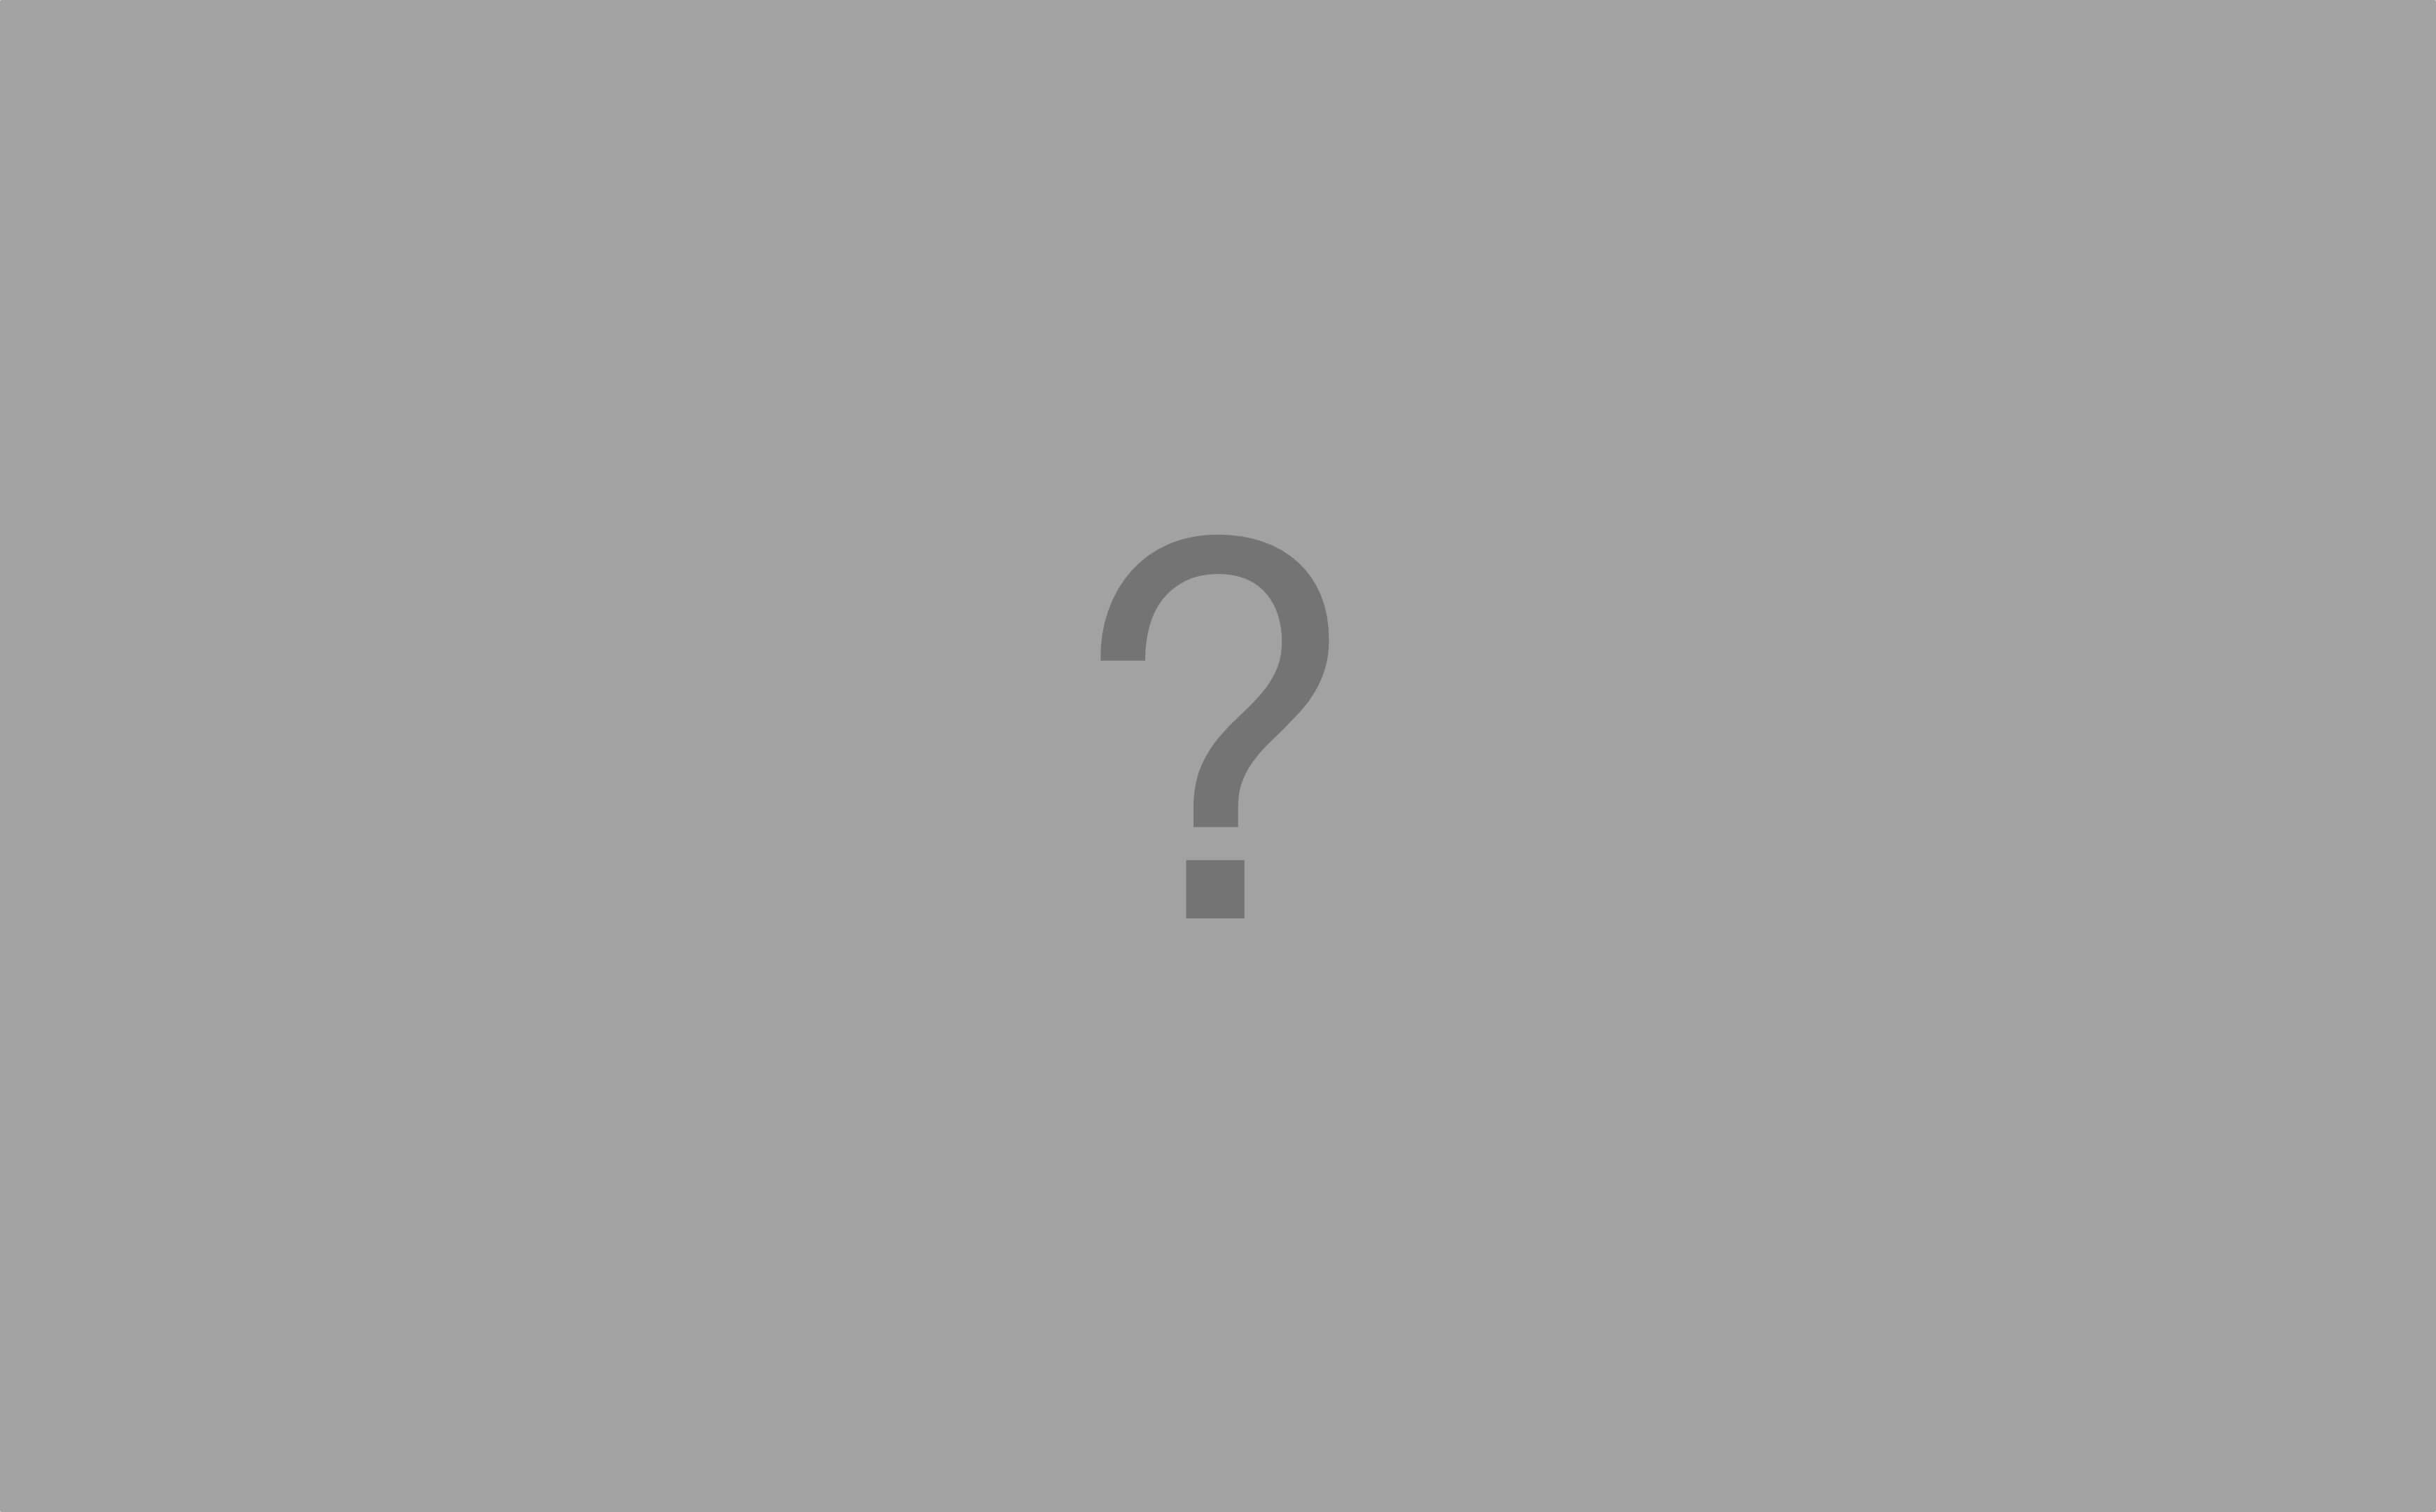 leak apple meldet zwei neue ipads an apfellike. Black Bedroom Furniture Sets. Home Design Ideas